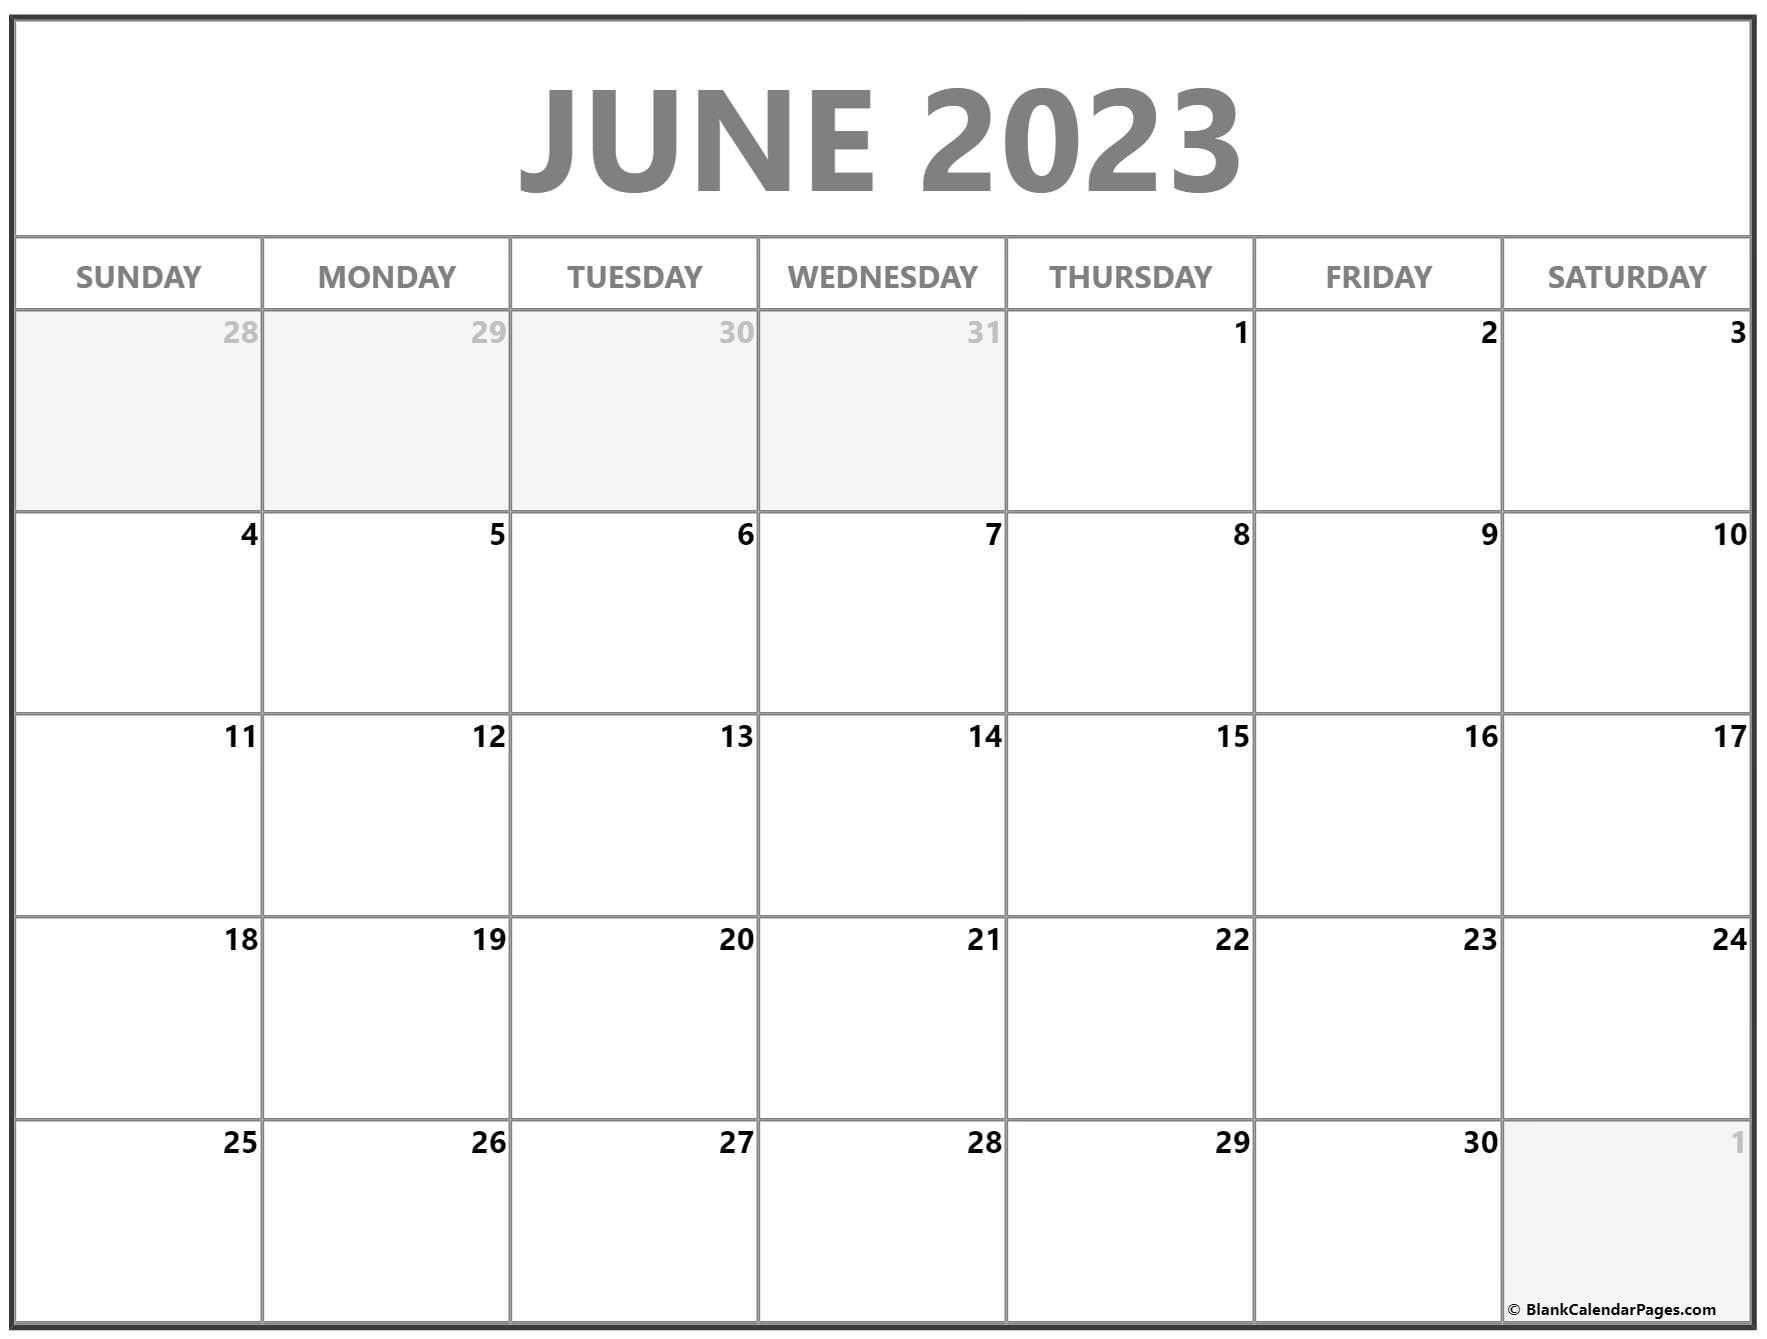 June 2022 calendar | free printable monthly calendars